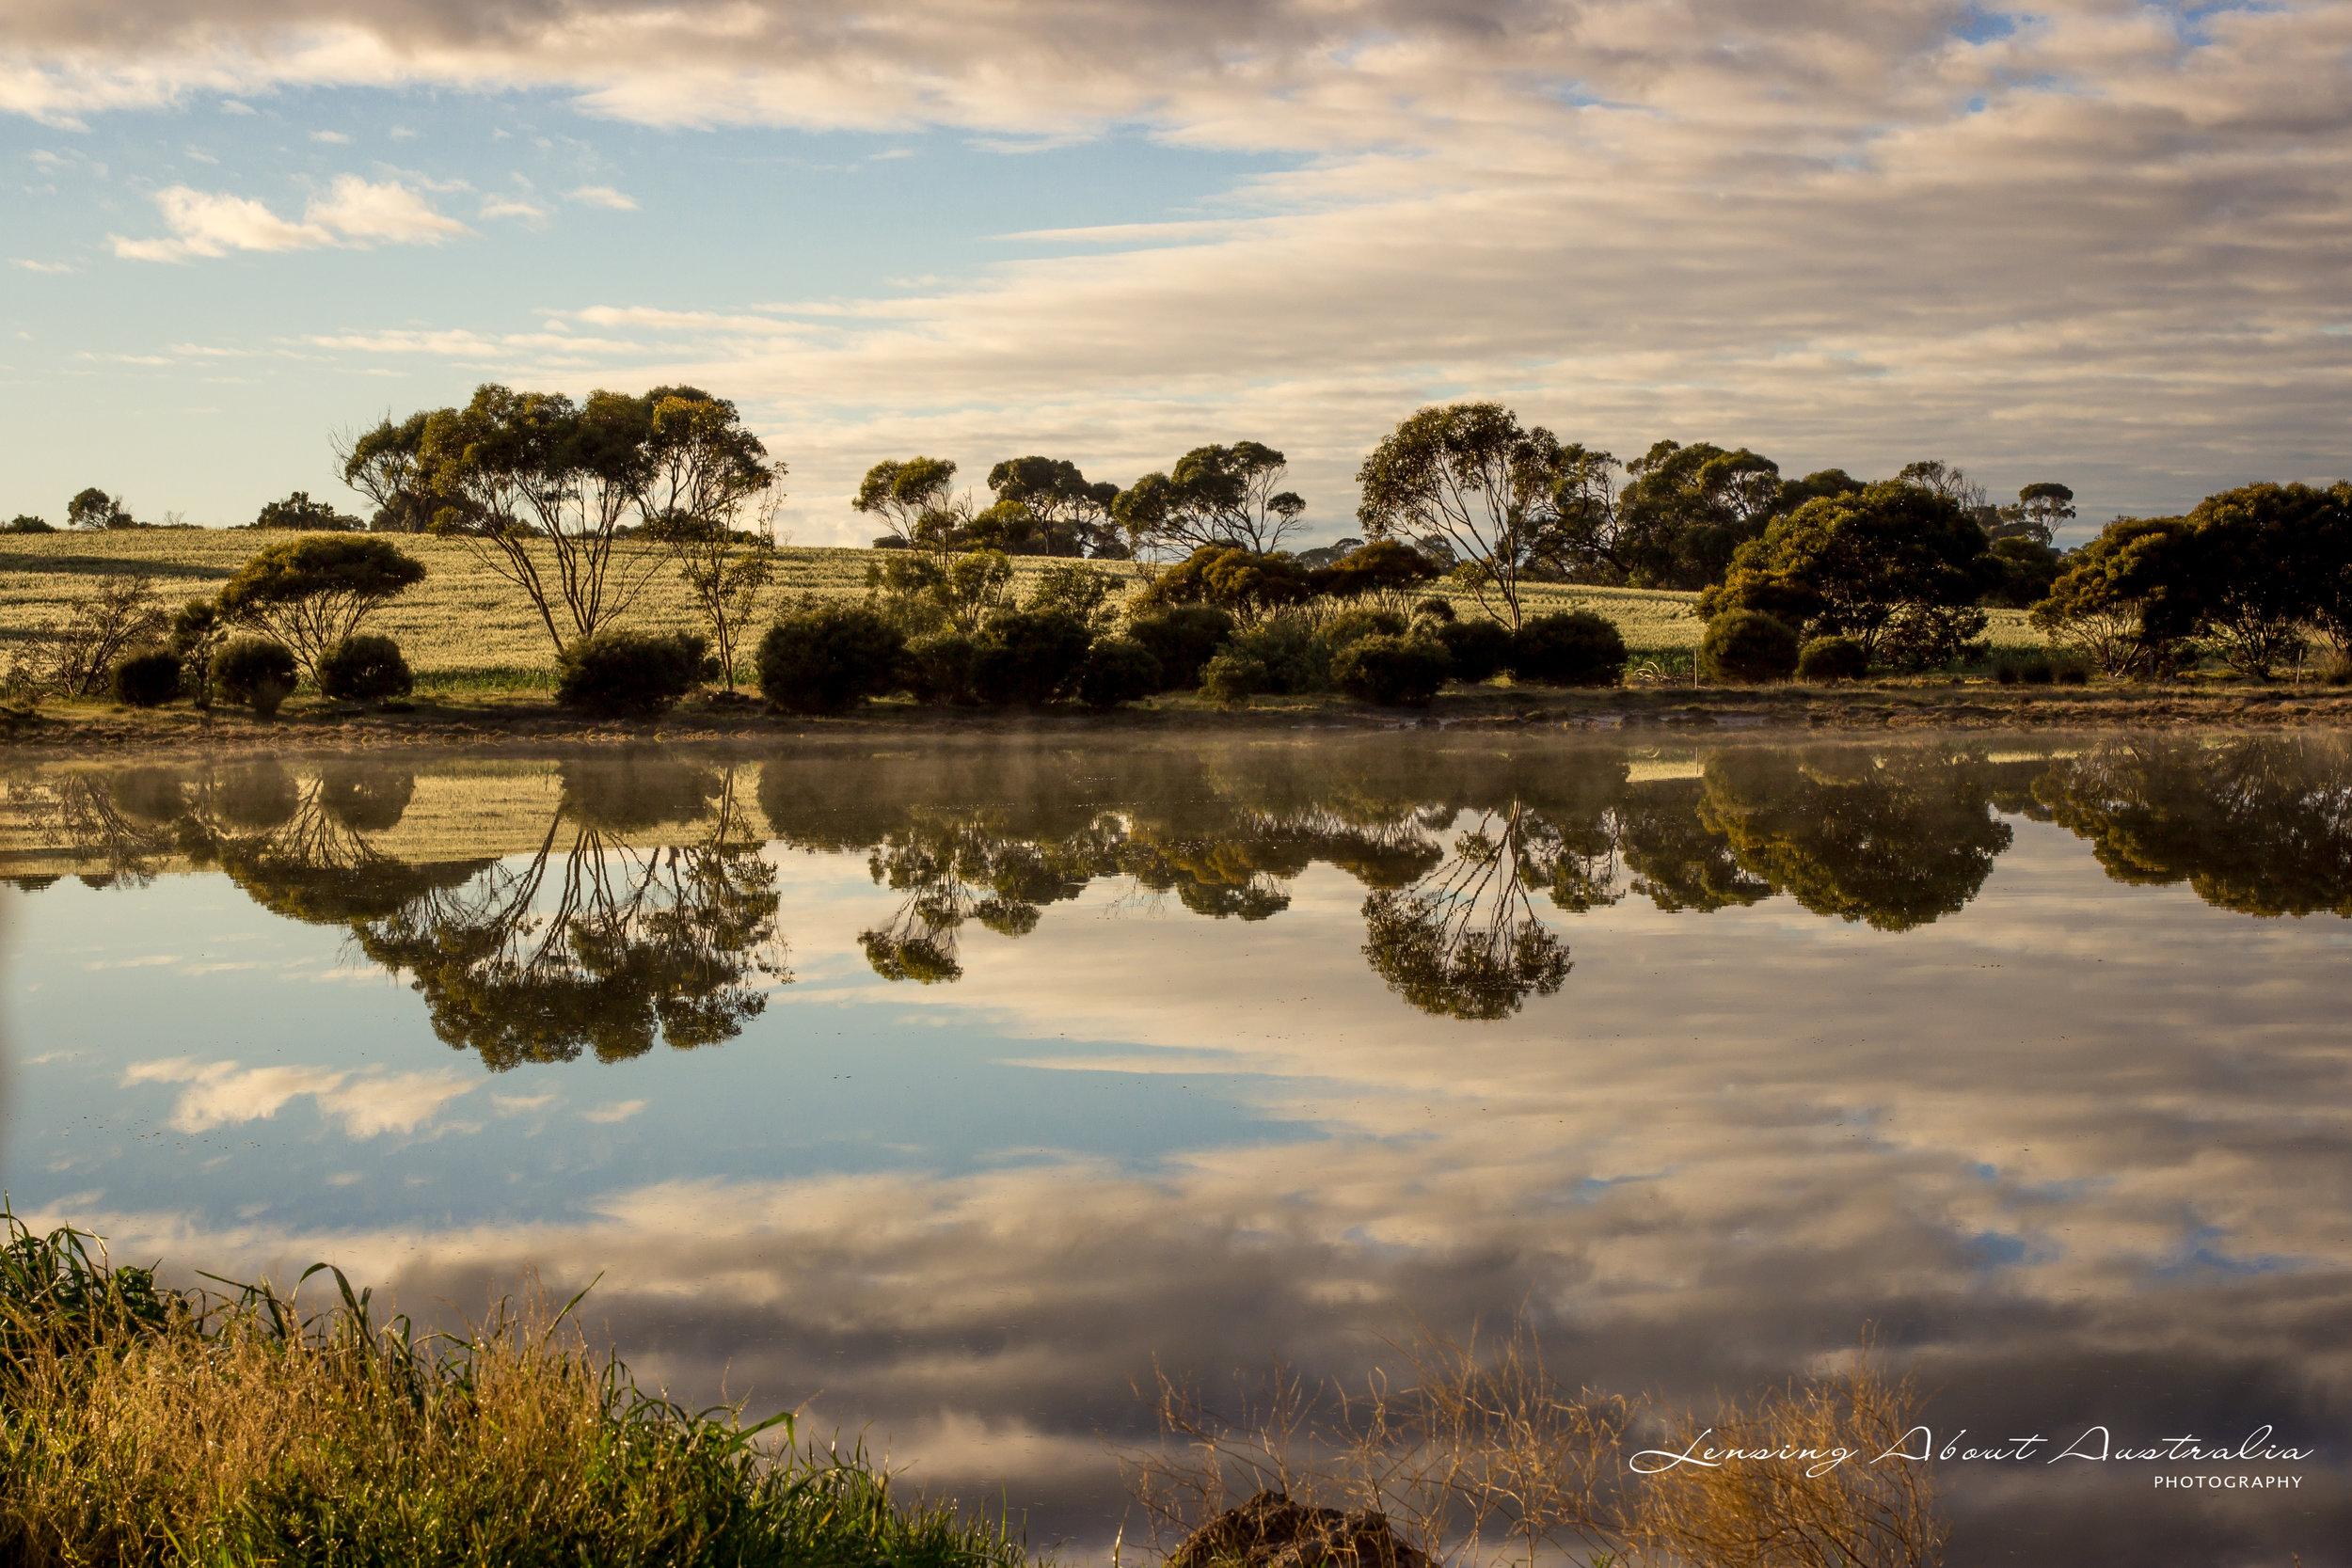 Minlaton, South Australia. Salt water wetlands reflection. Cannon EOS 600D, 50mm, ISO 100, f11, 1/200sec.